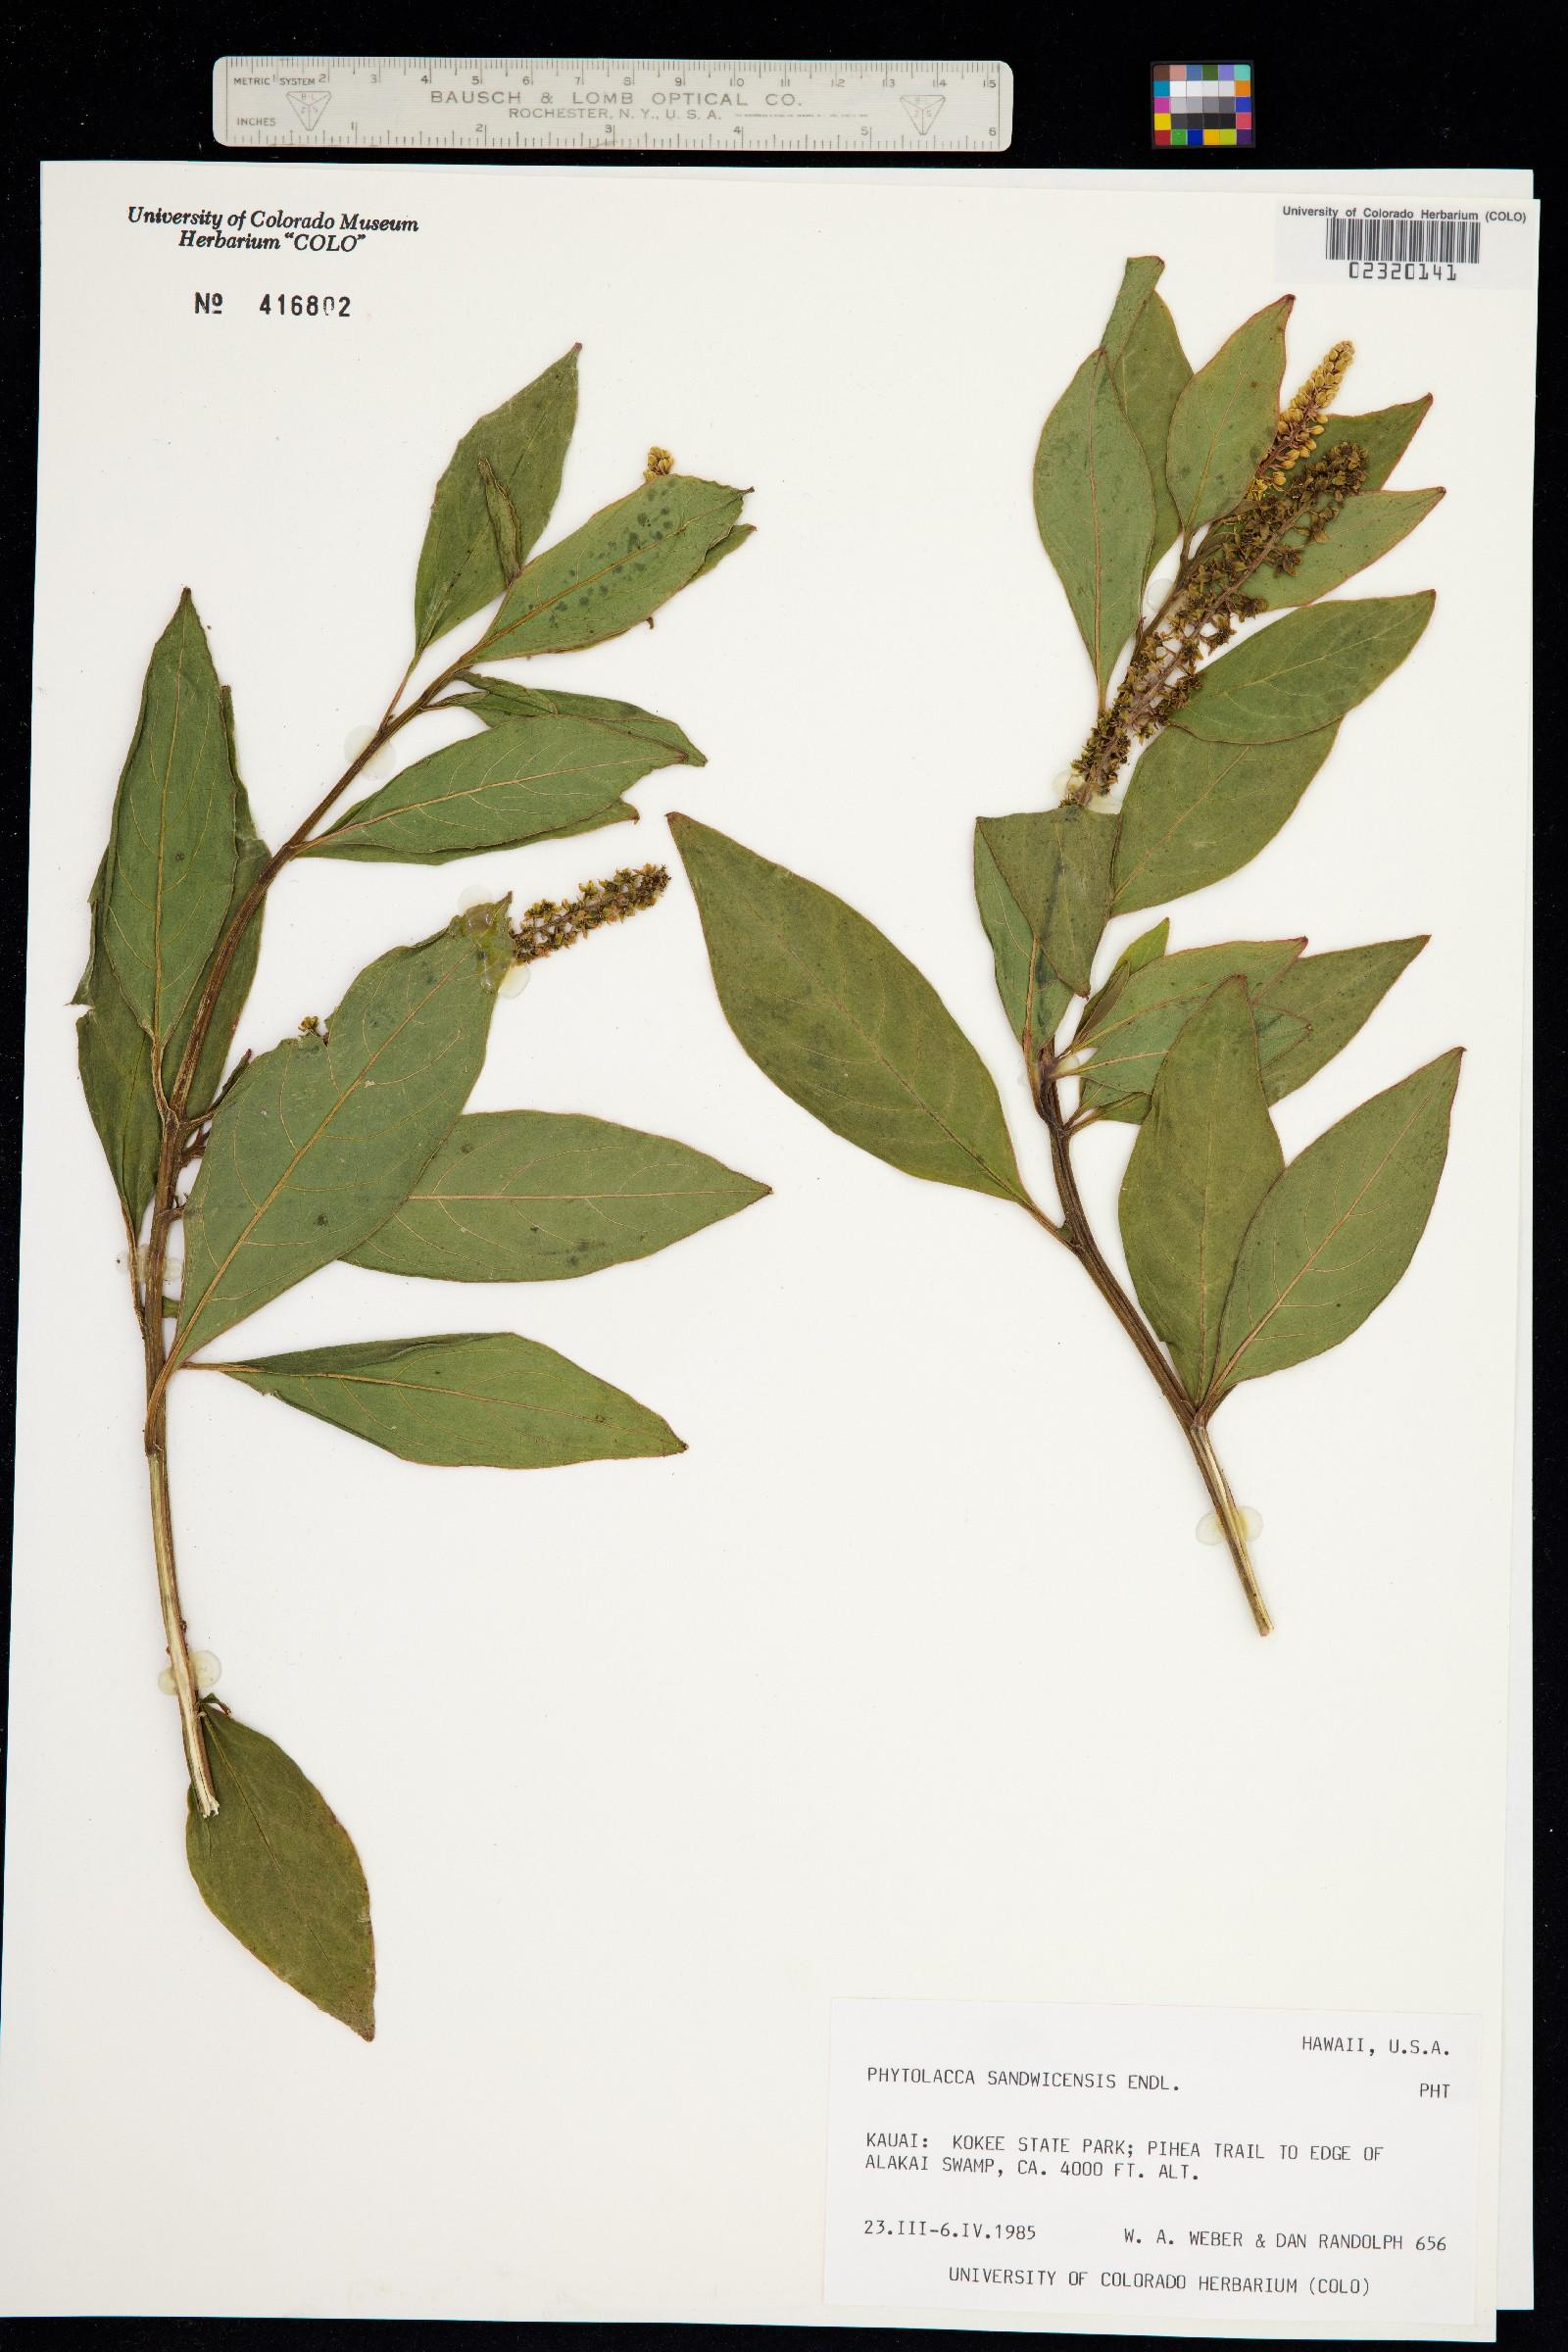 Phytolacca sandwicensis image